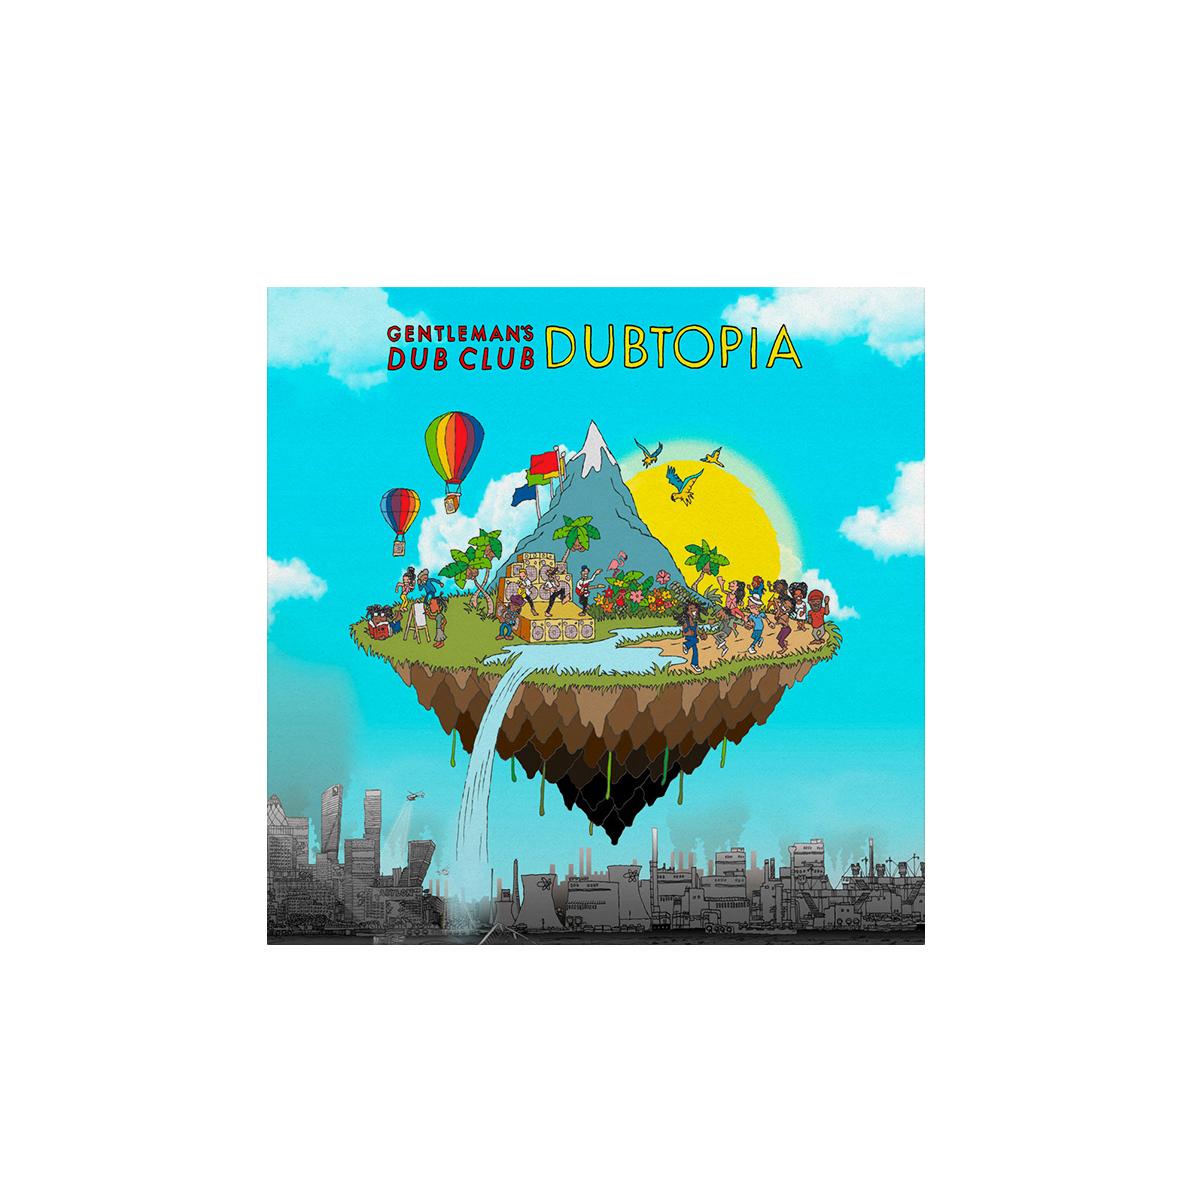 Gentleman's Dub Club - Dubtopia Album Download